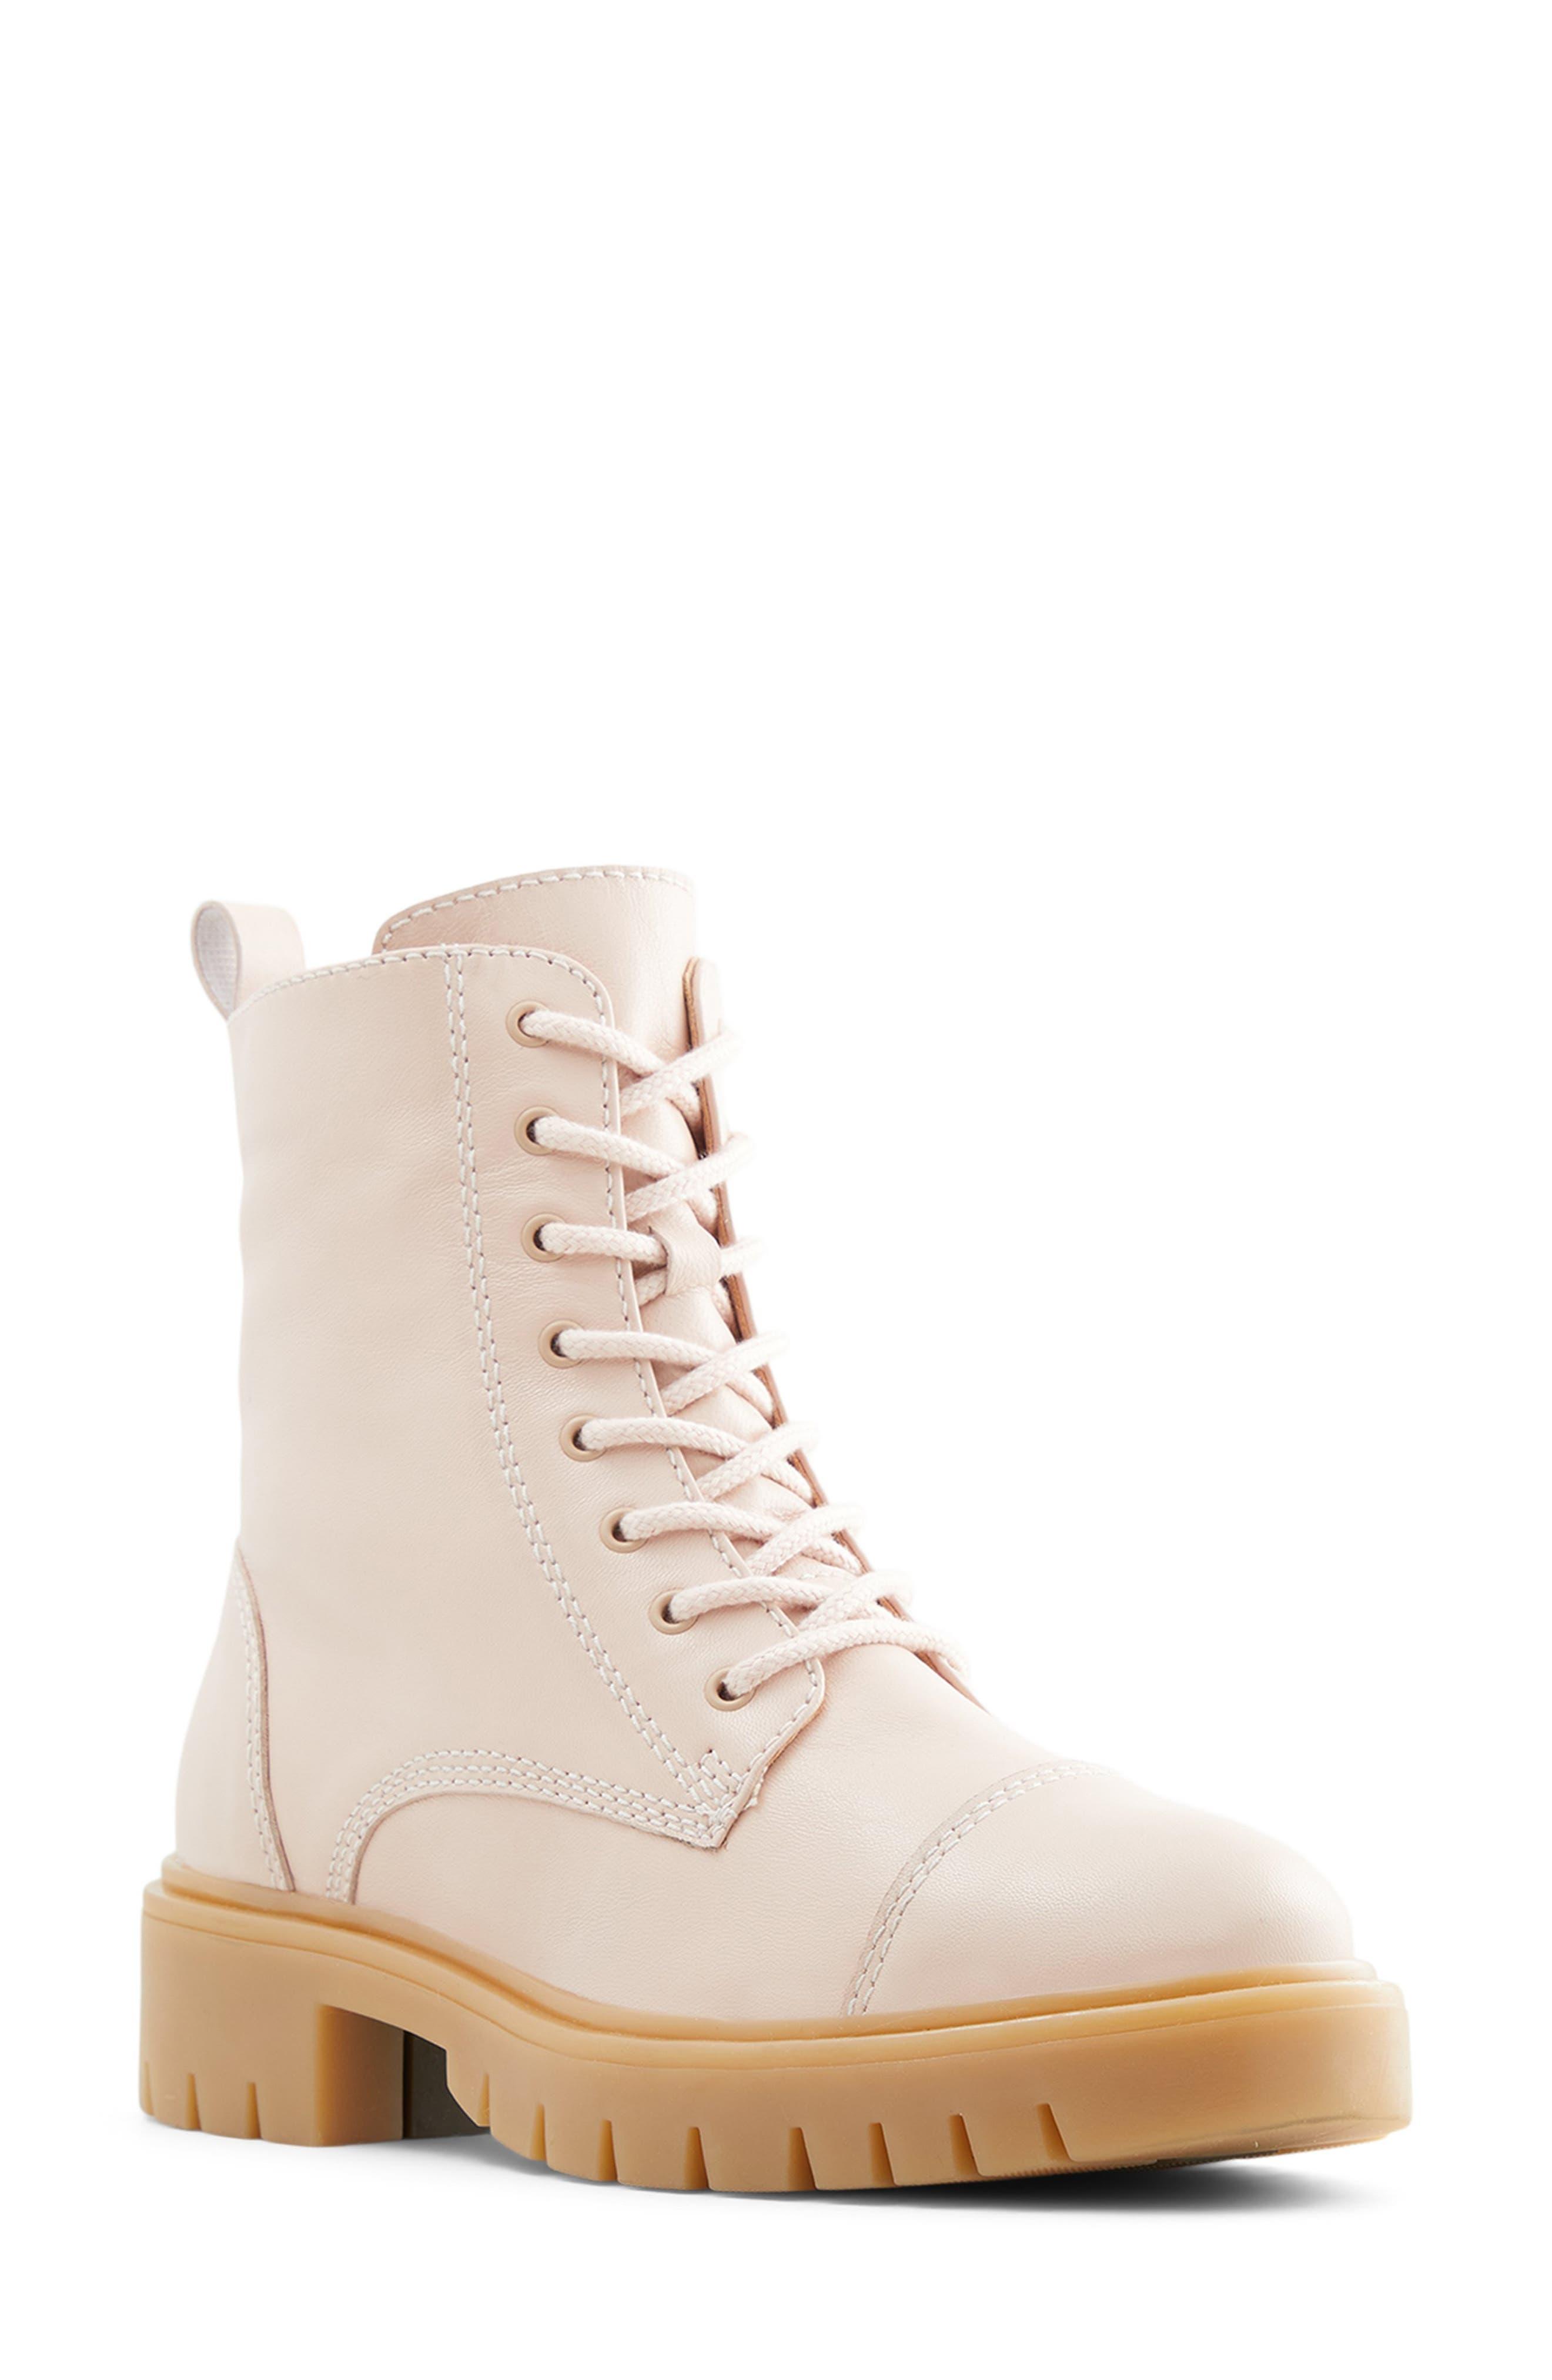 Reilly Combat Boot